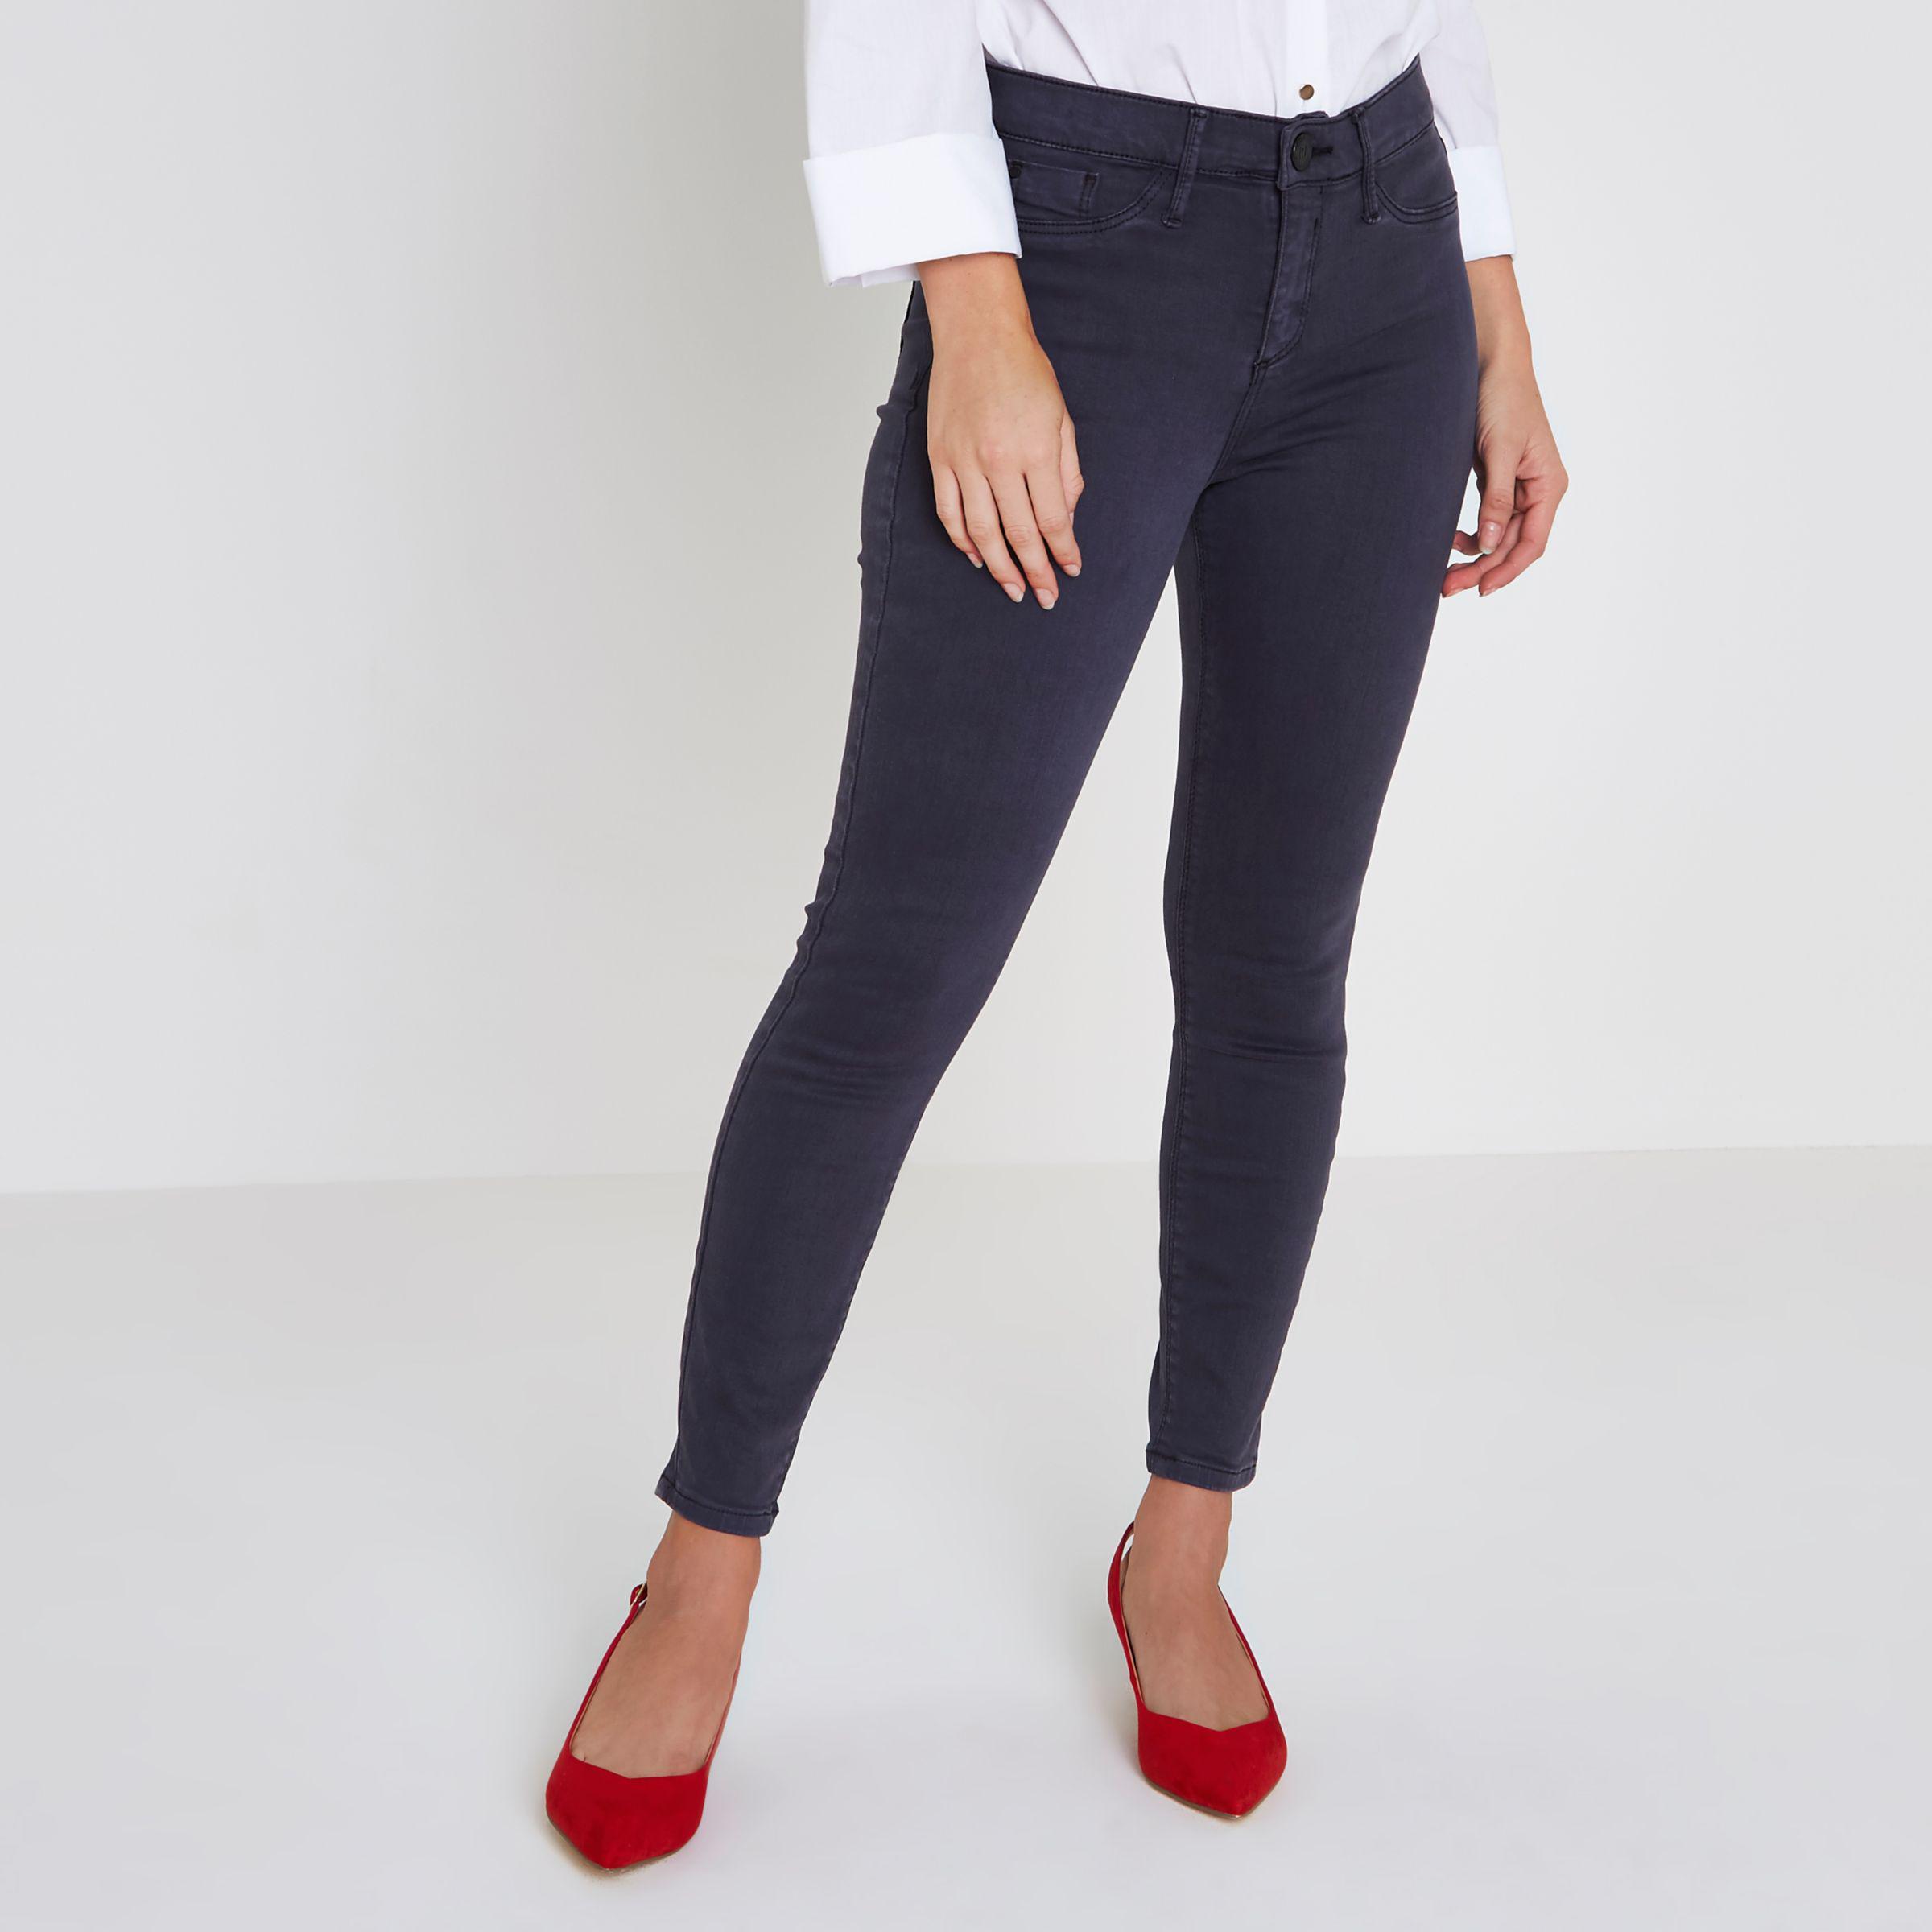 83e0e311495dd Gallery. Women's Jeggings Women's Chinos Women's Red Leather Pants ...